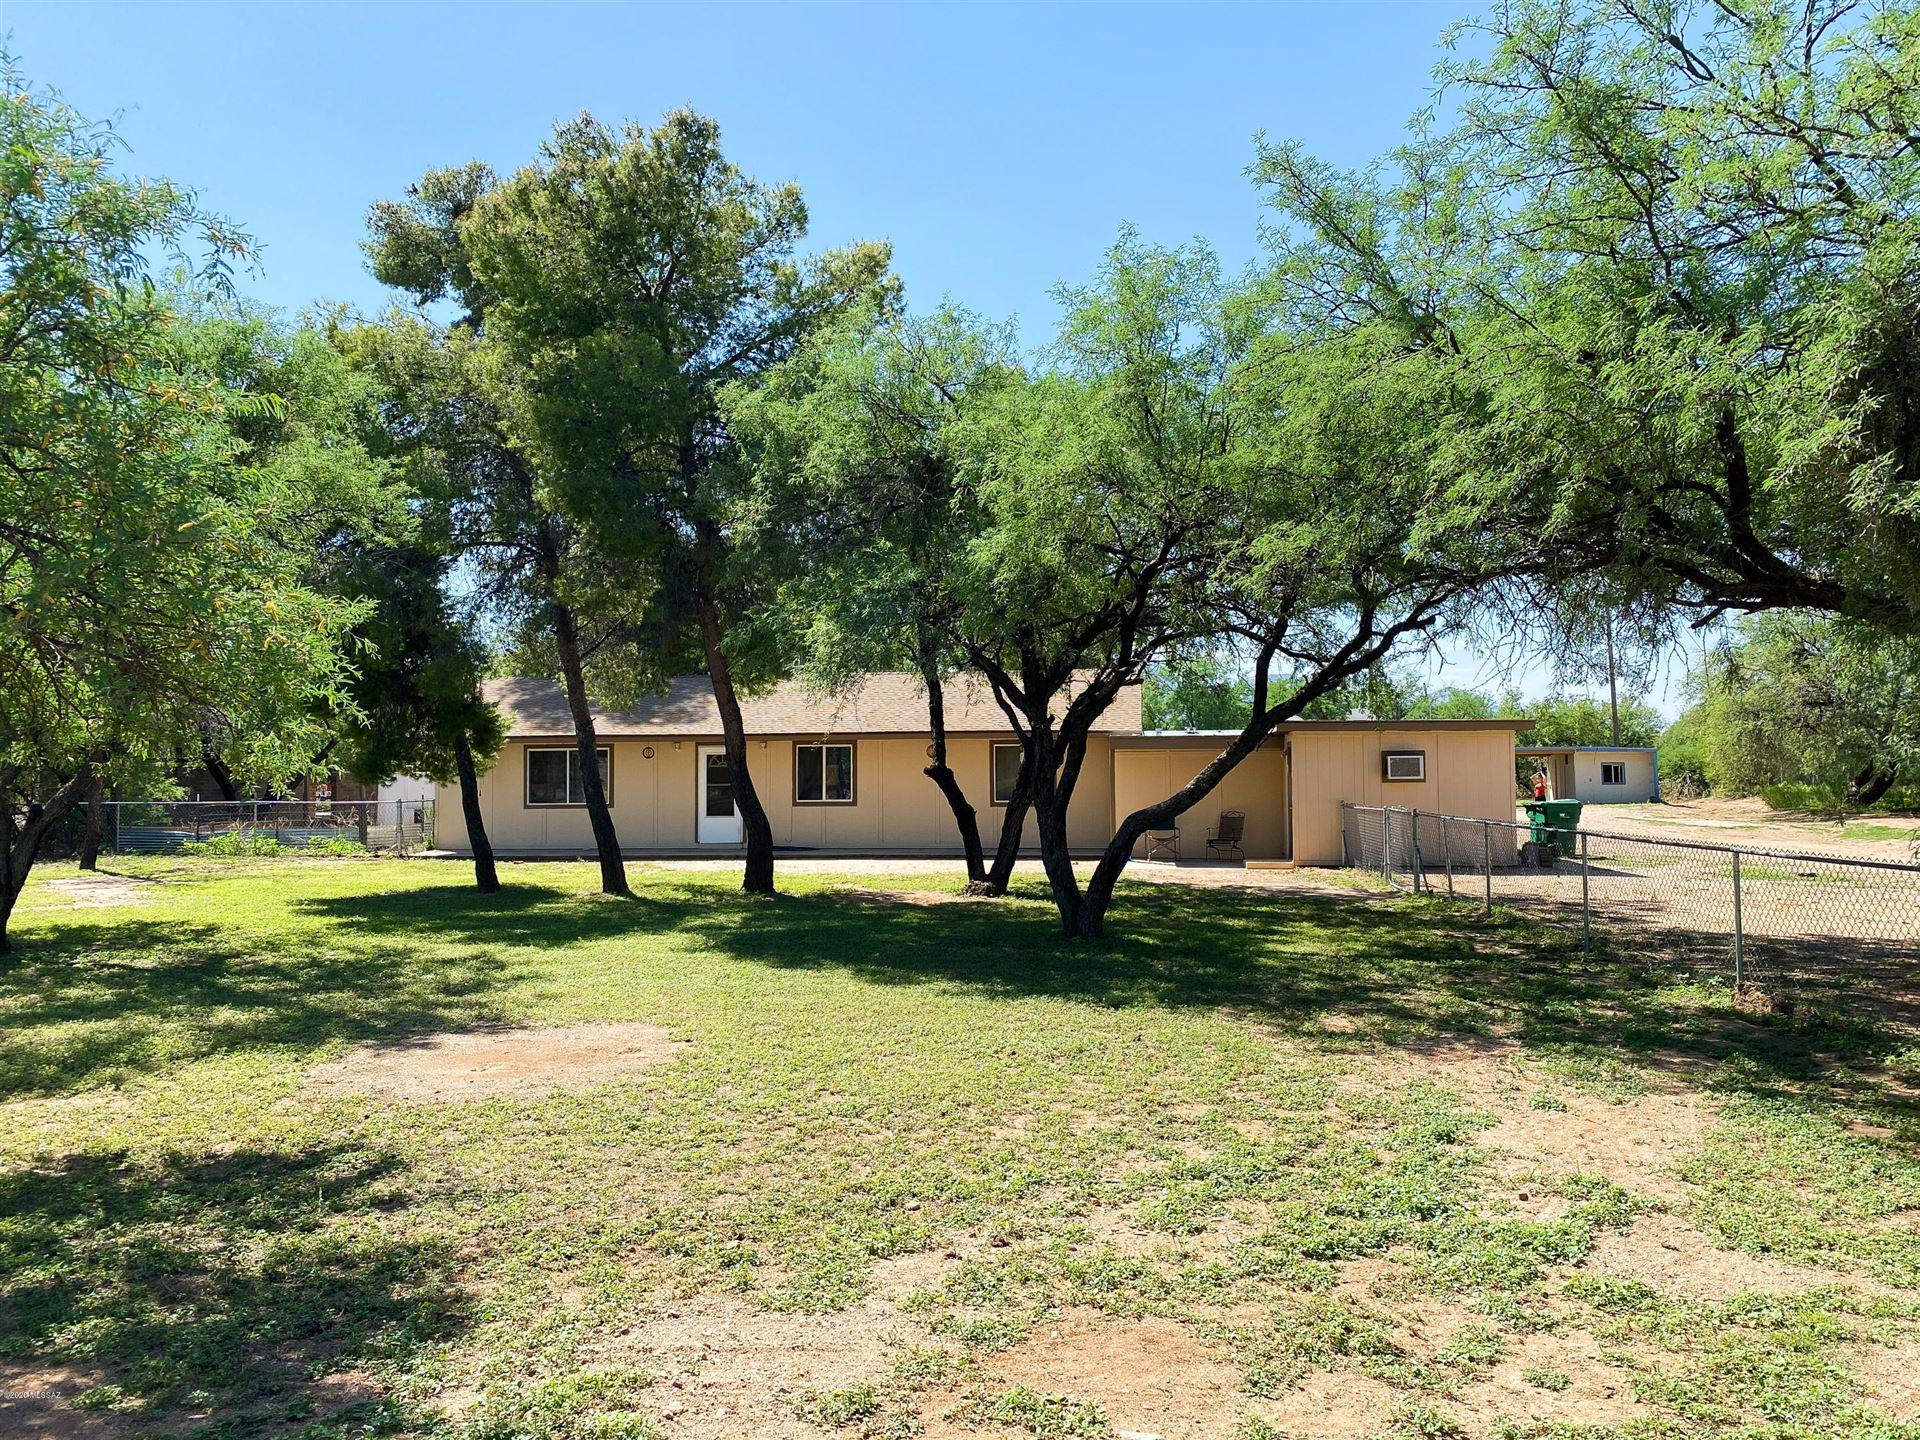 3820 E Hawser Street, Tucson, AZ 85739 - #: 22028305